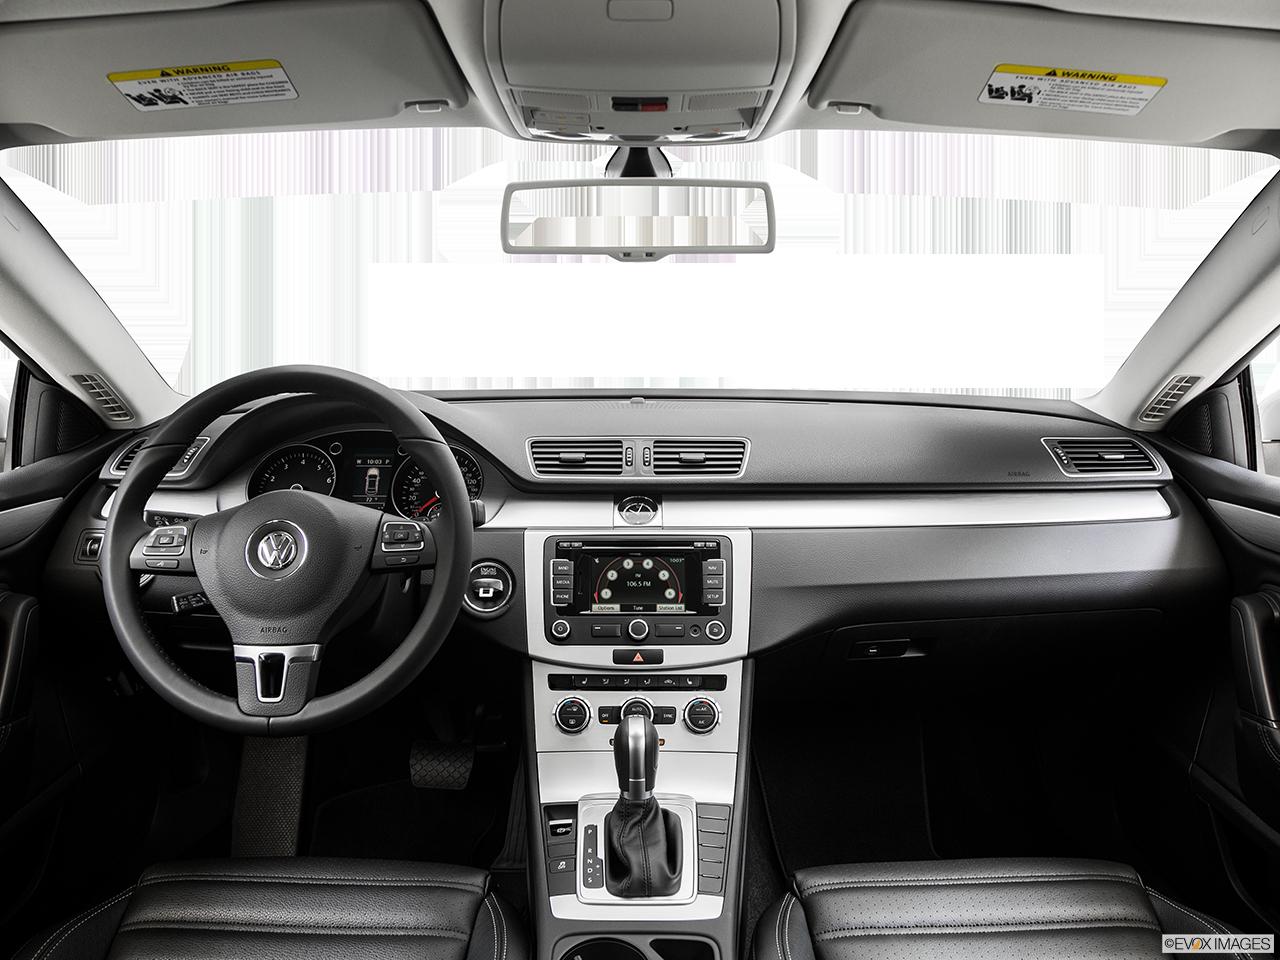 Interior View Of 2015 Volkswagen CC in Franklin